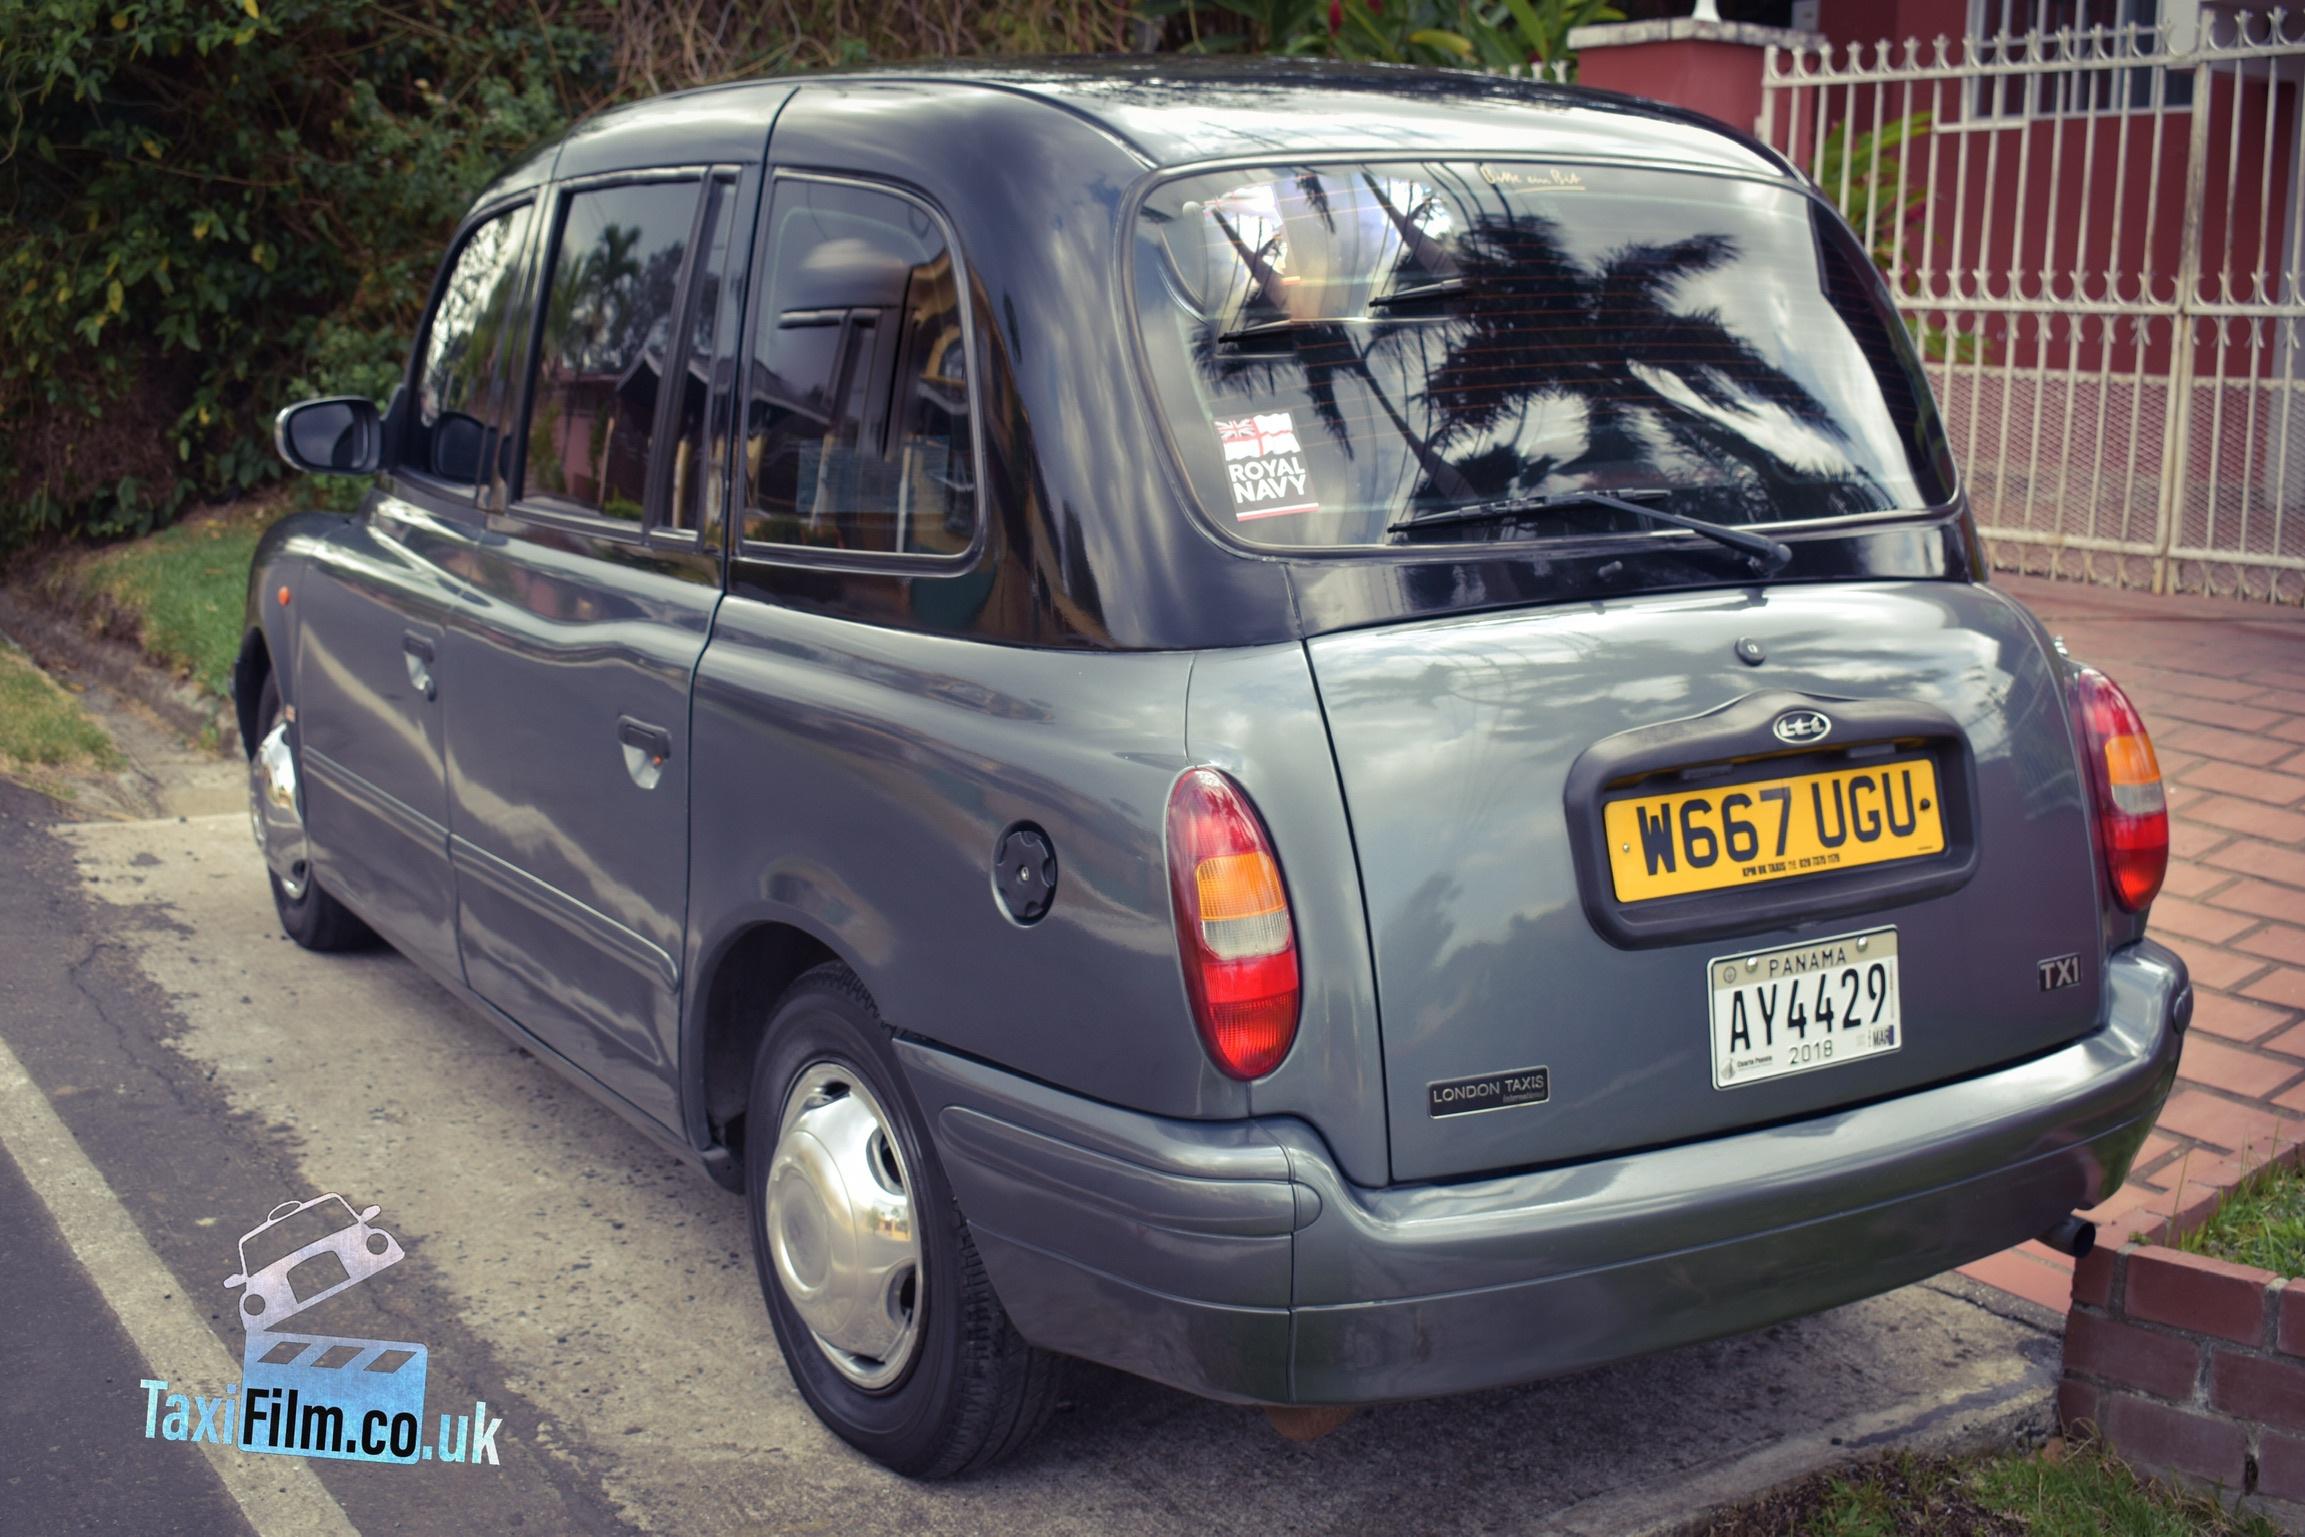 Black over Silver LTI TX1 Taxi 2000, Panama ref PAN001